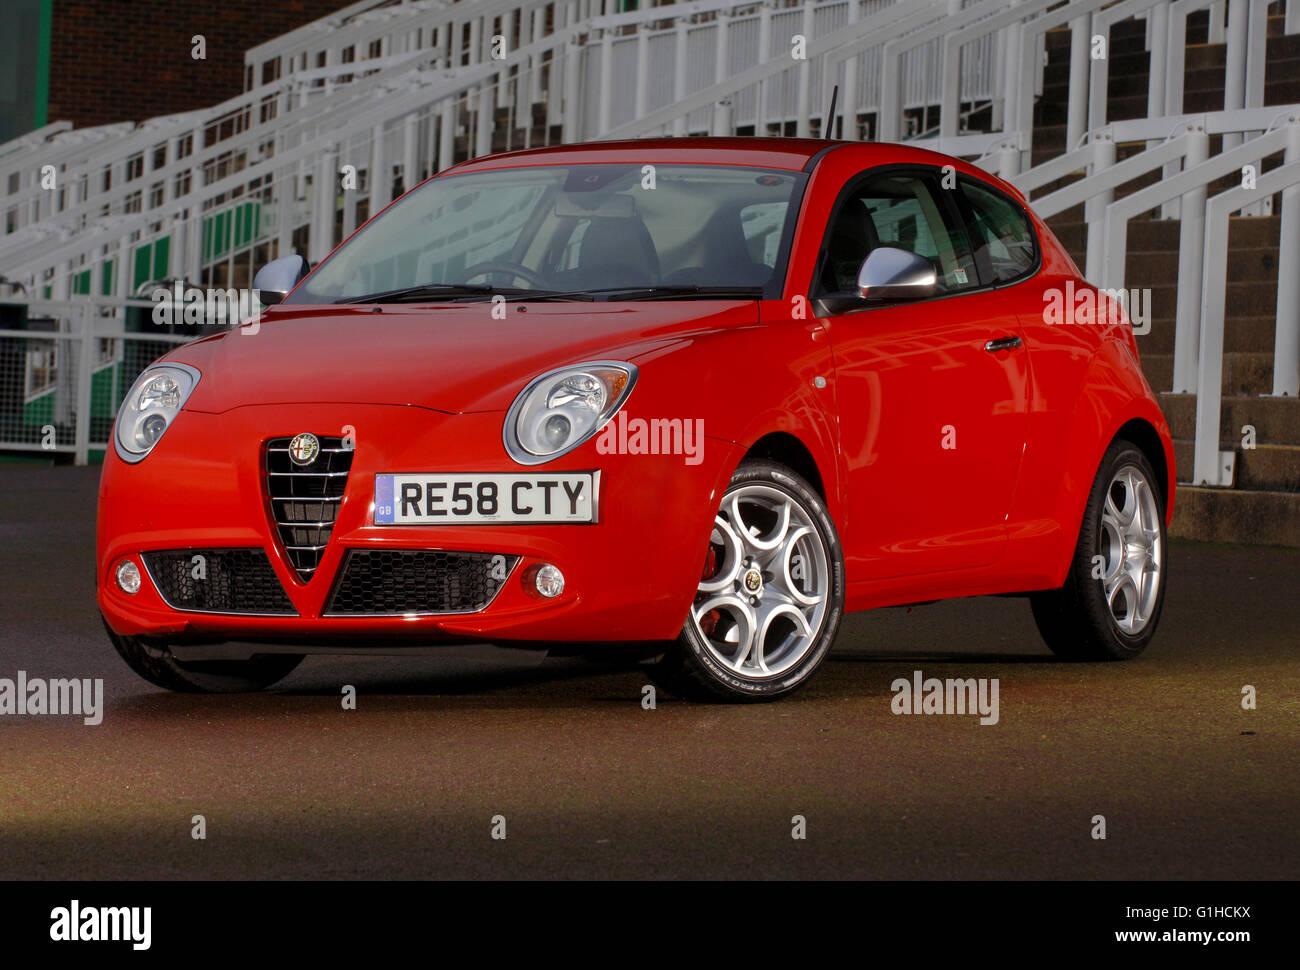 Alfa Romeo Mito Stock Photos Alfa Romeo Mito Stock Images Alamy